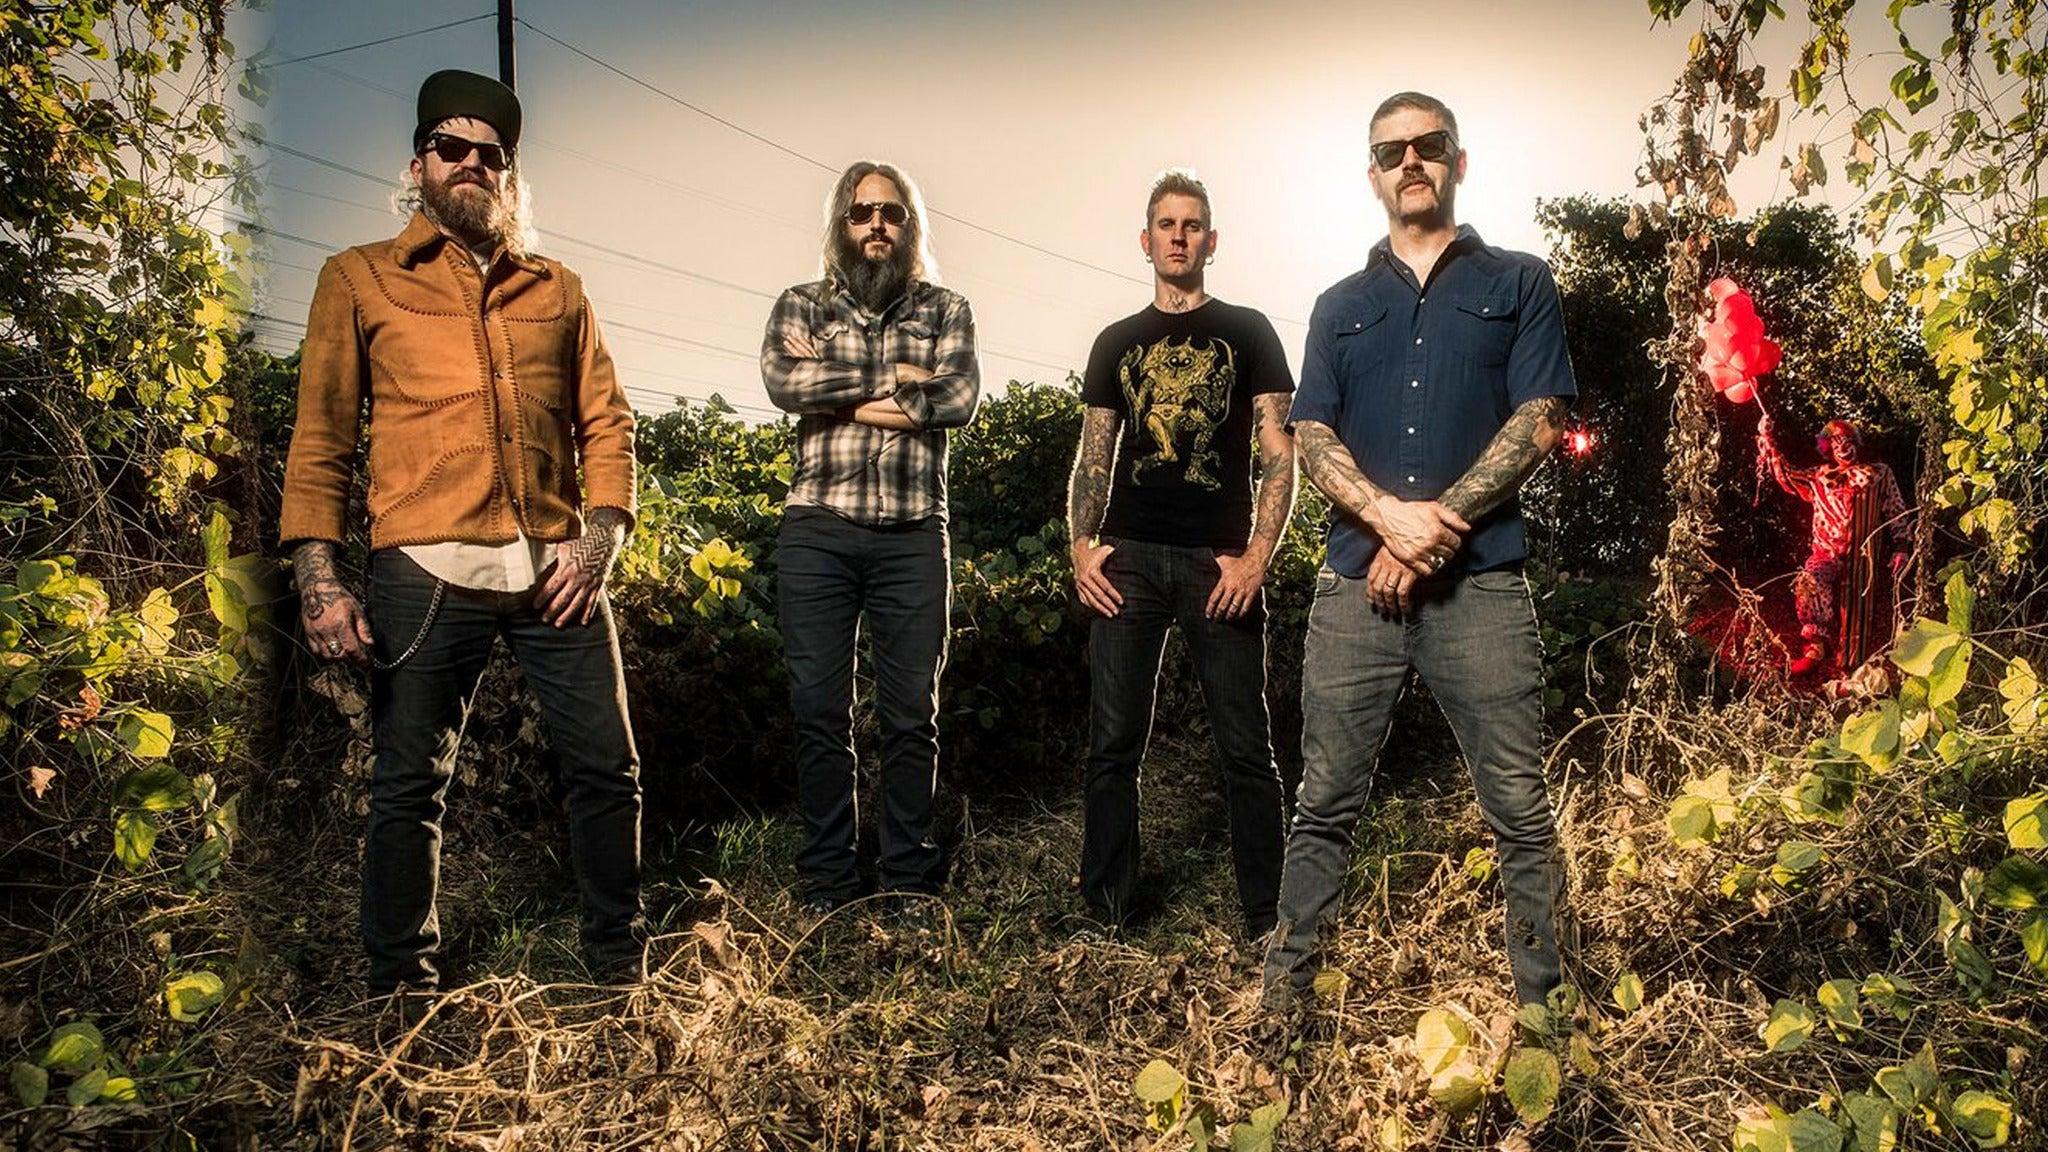 Mastodon / Opeth presale password